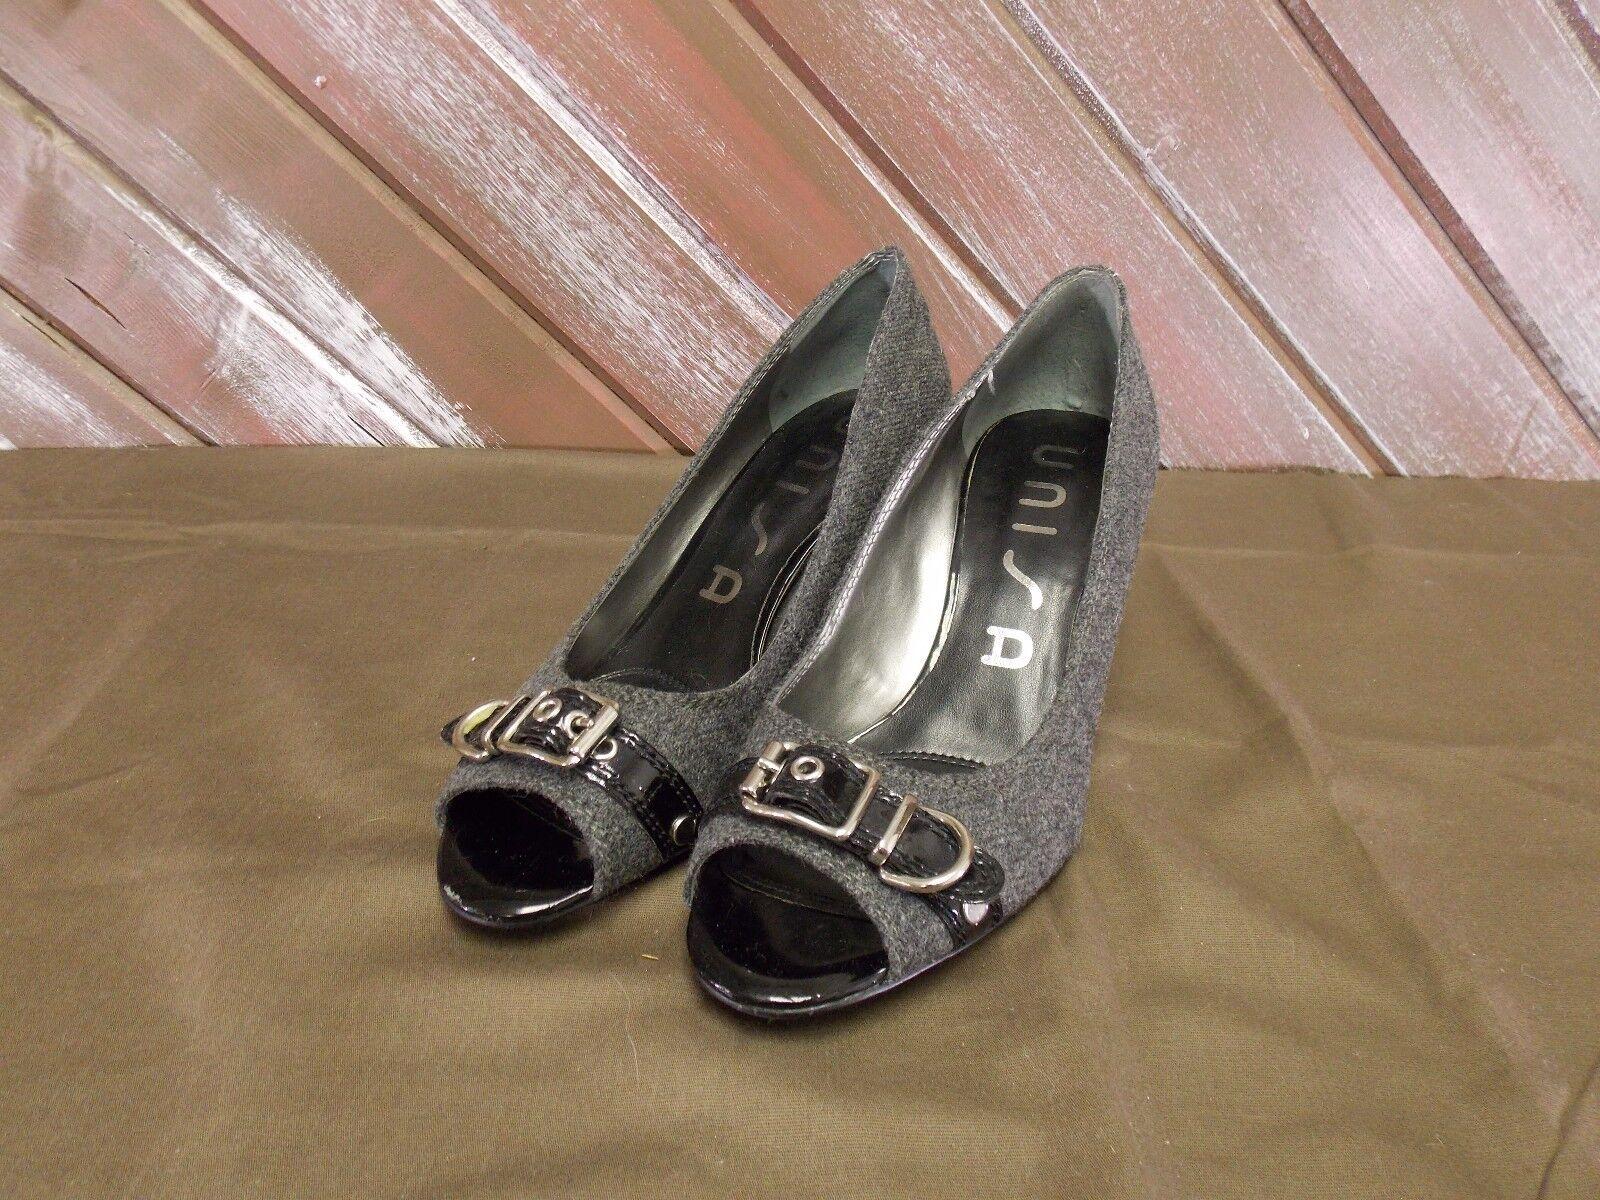 Unisa Shoes  Gray Heels Open Toed Women's Black & Gray  Size 8.5M 12e8d6